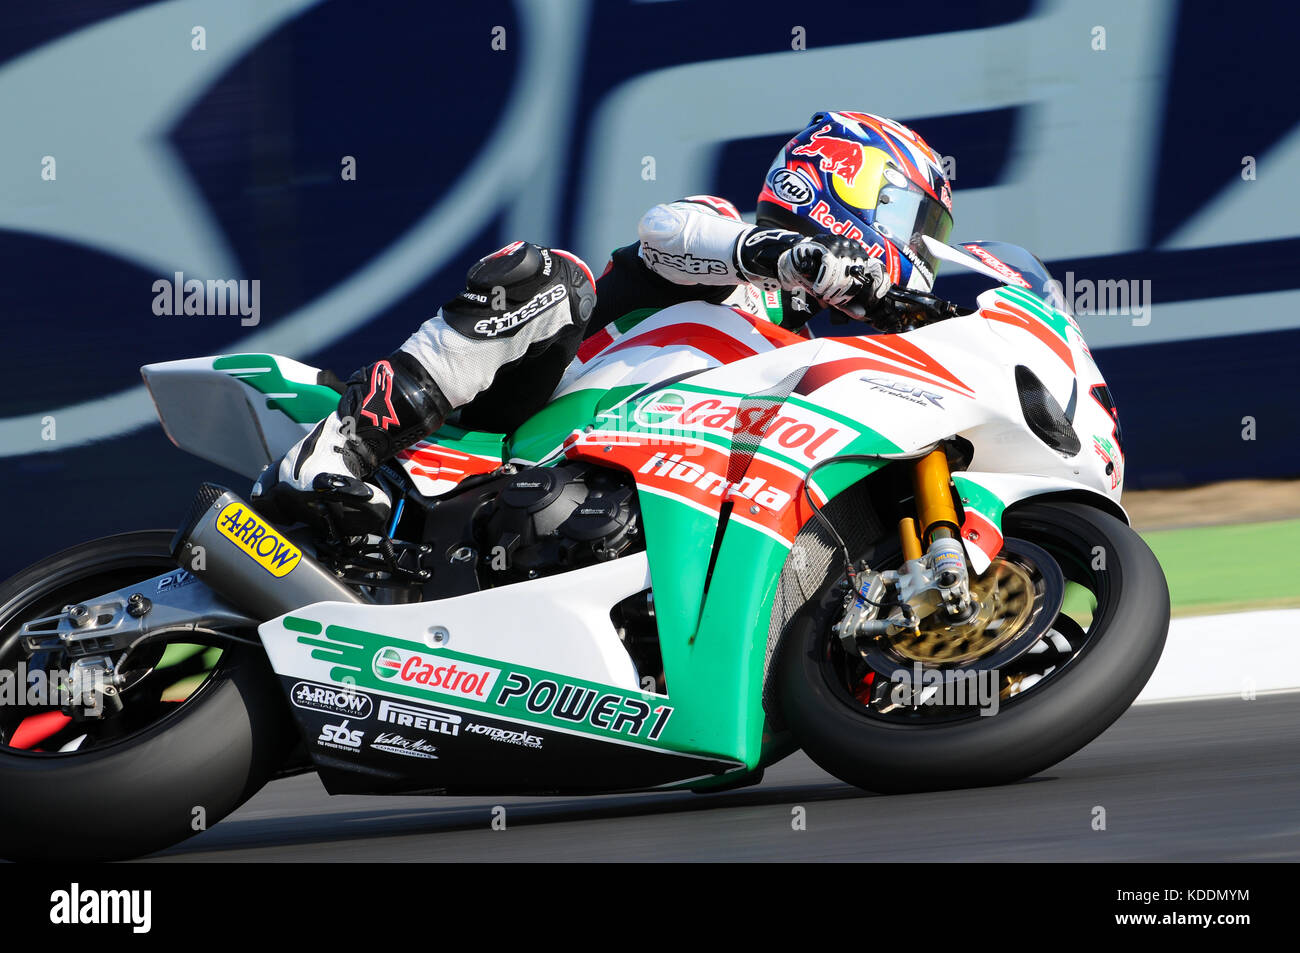 San Marino, Italy - Sep 24, 2011: Jonathan Rea GBR (Honda CBR1000RR) Castrol Honda in action during the Superbike Stock Photo